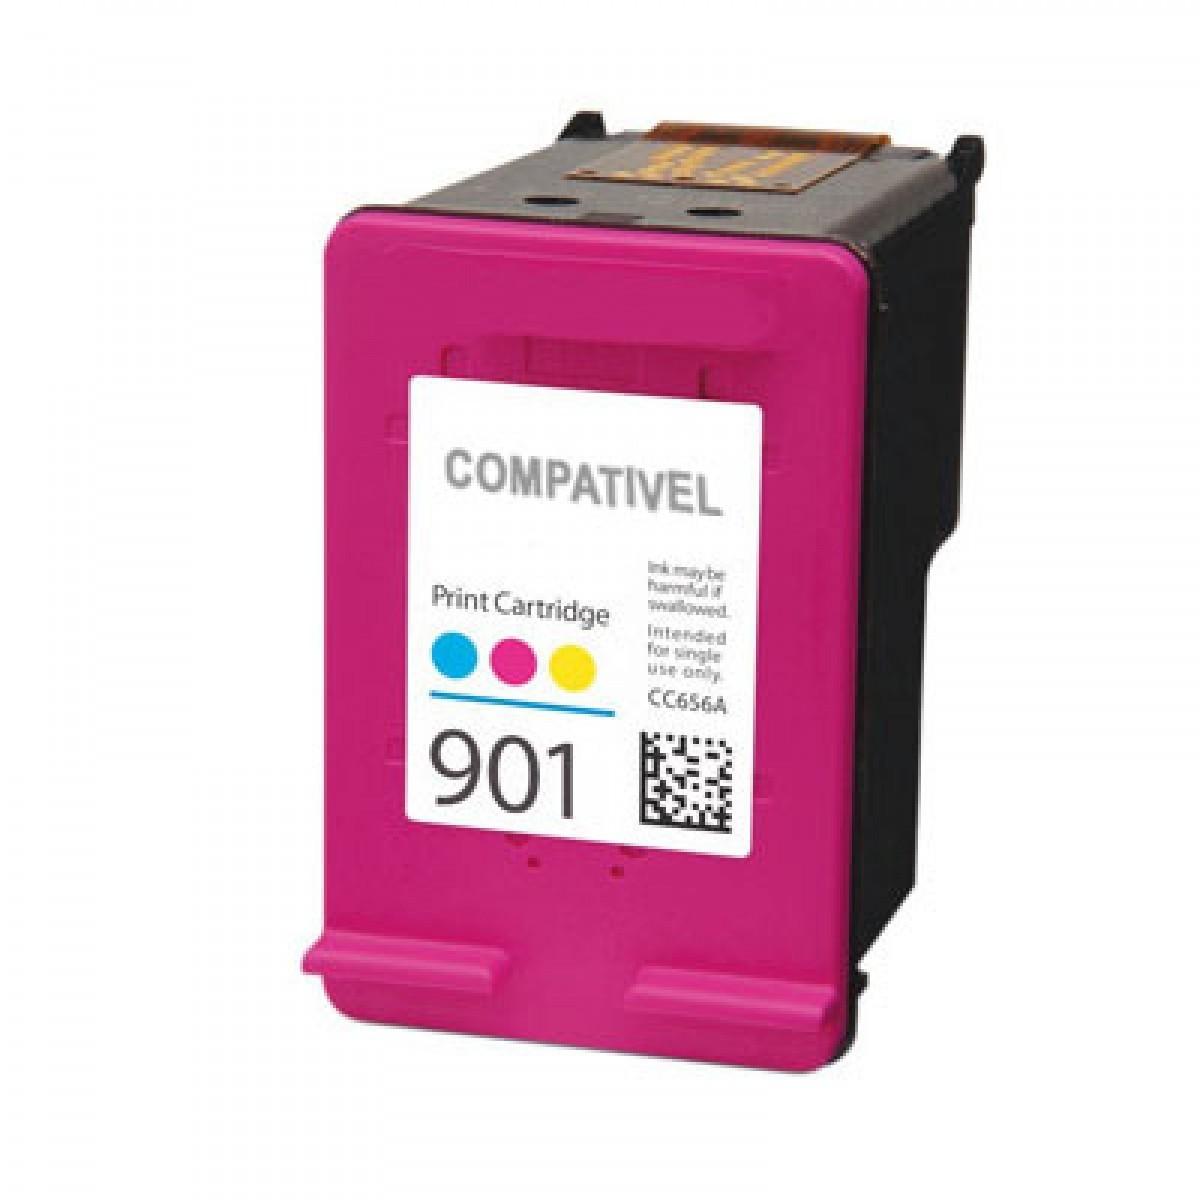 CARTUCHO DE TINTA HP 901 COLOR COMPATÍVEL XL